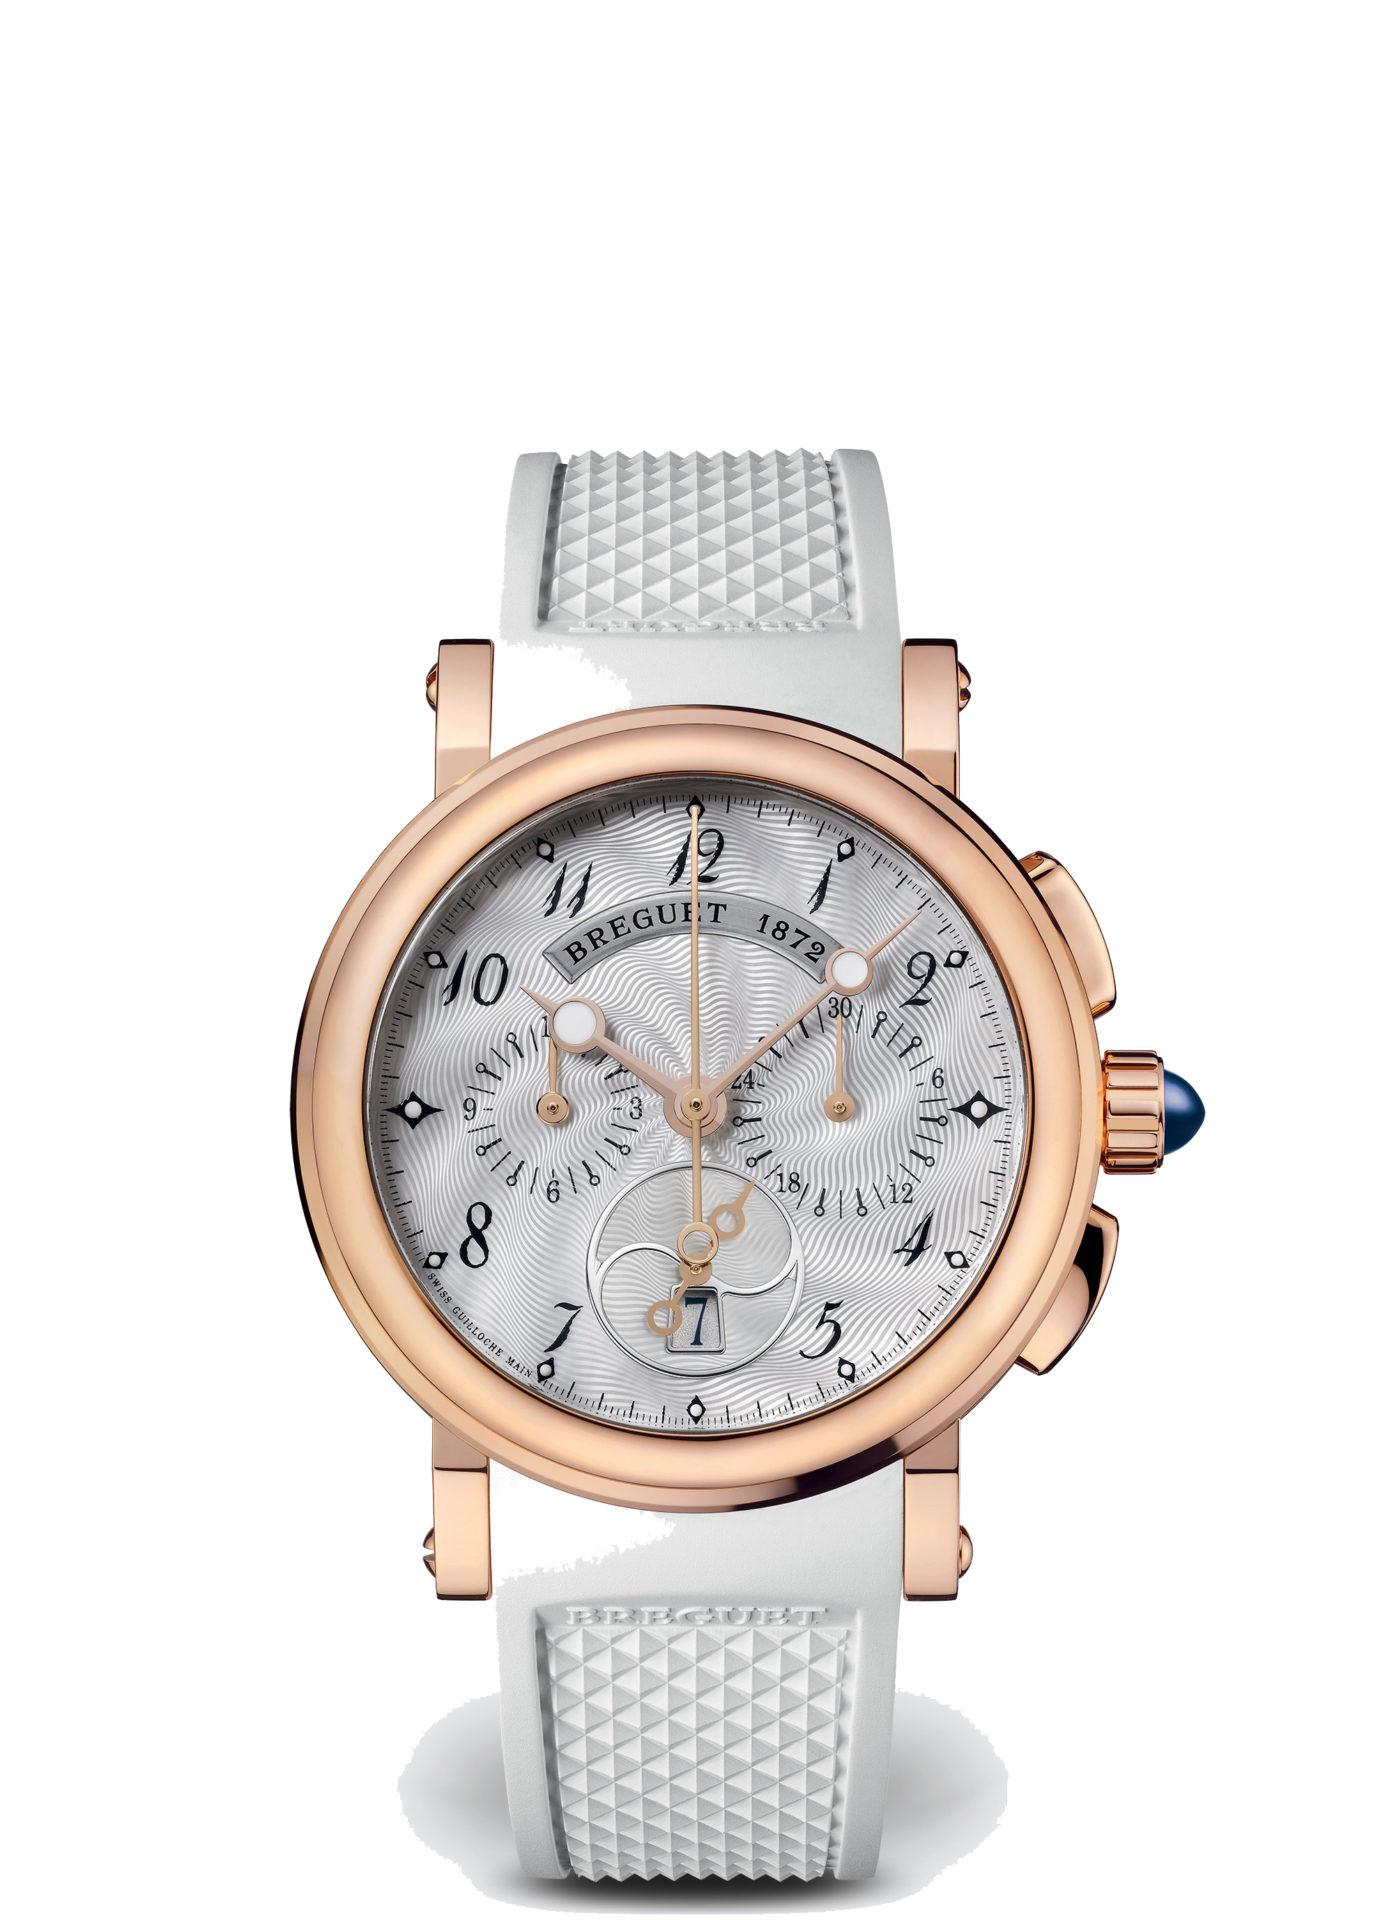 Breguet-La-Marine-8827-Hall-of-Time-8827br-52-586